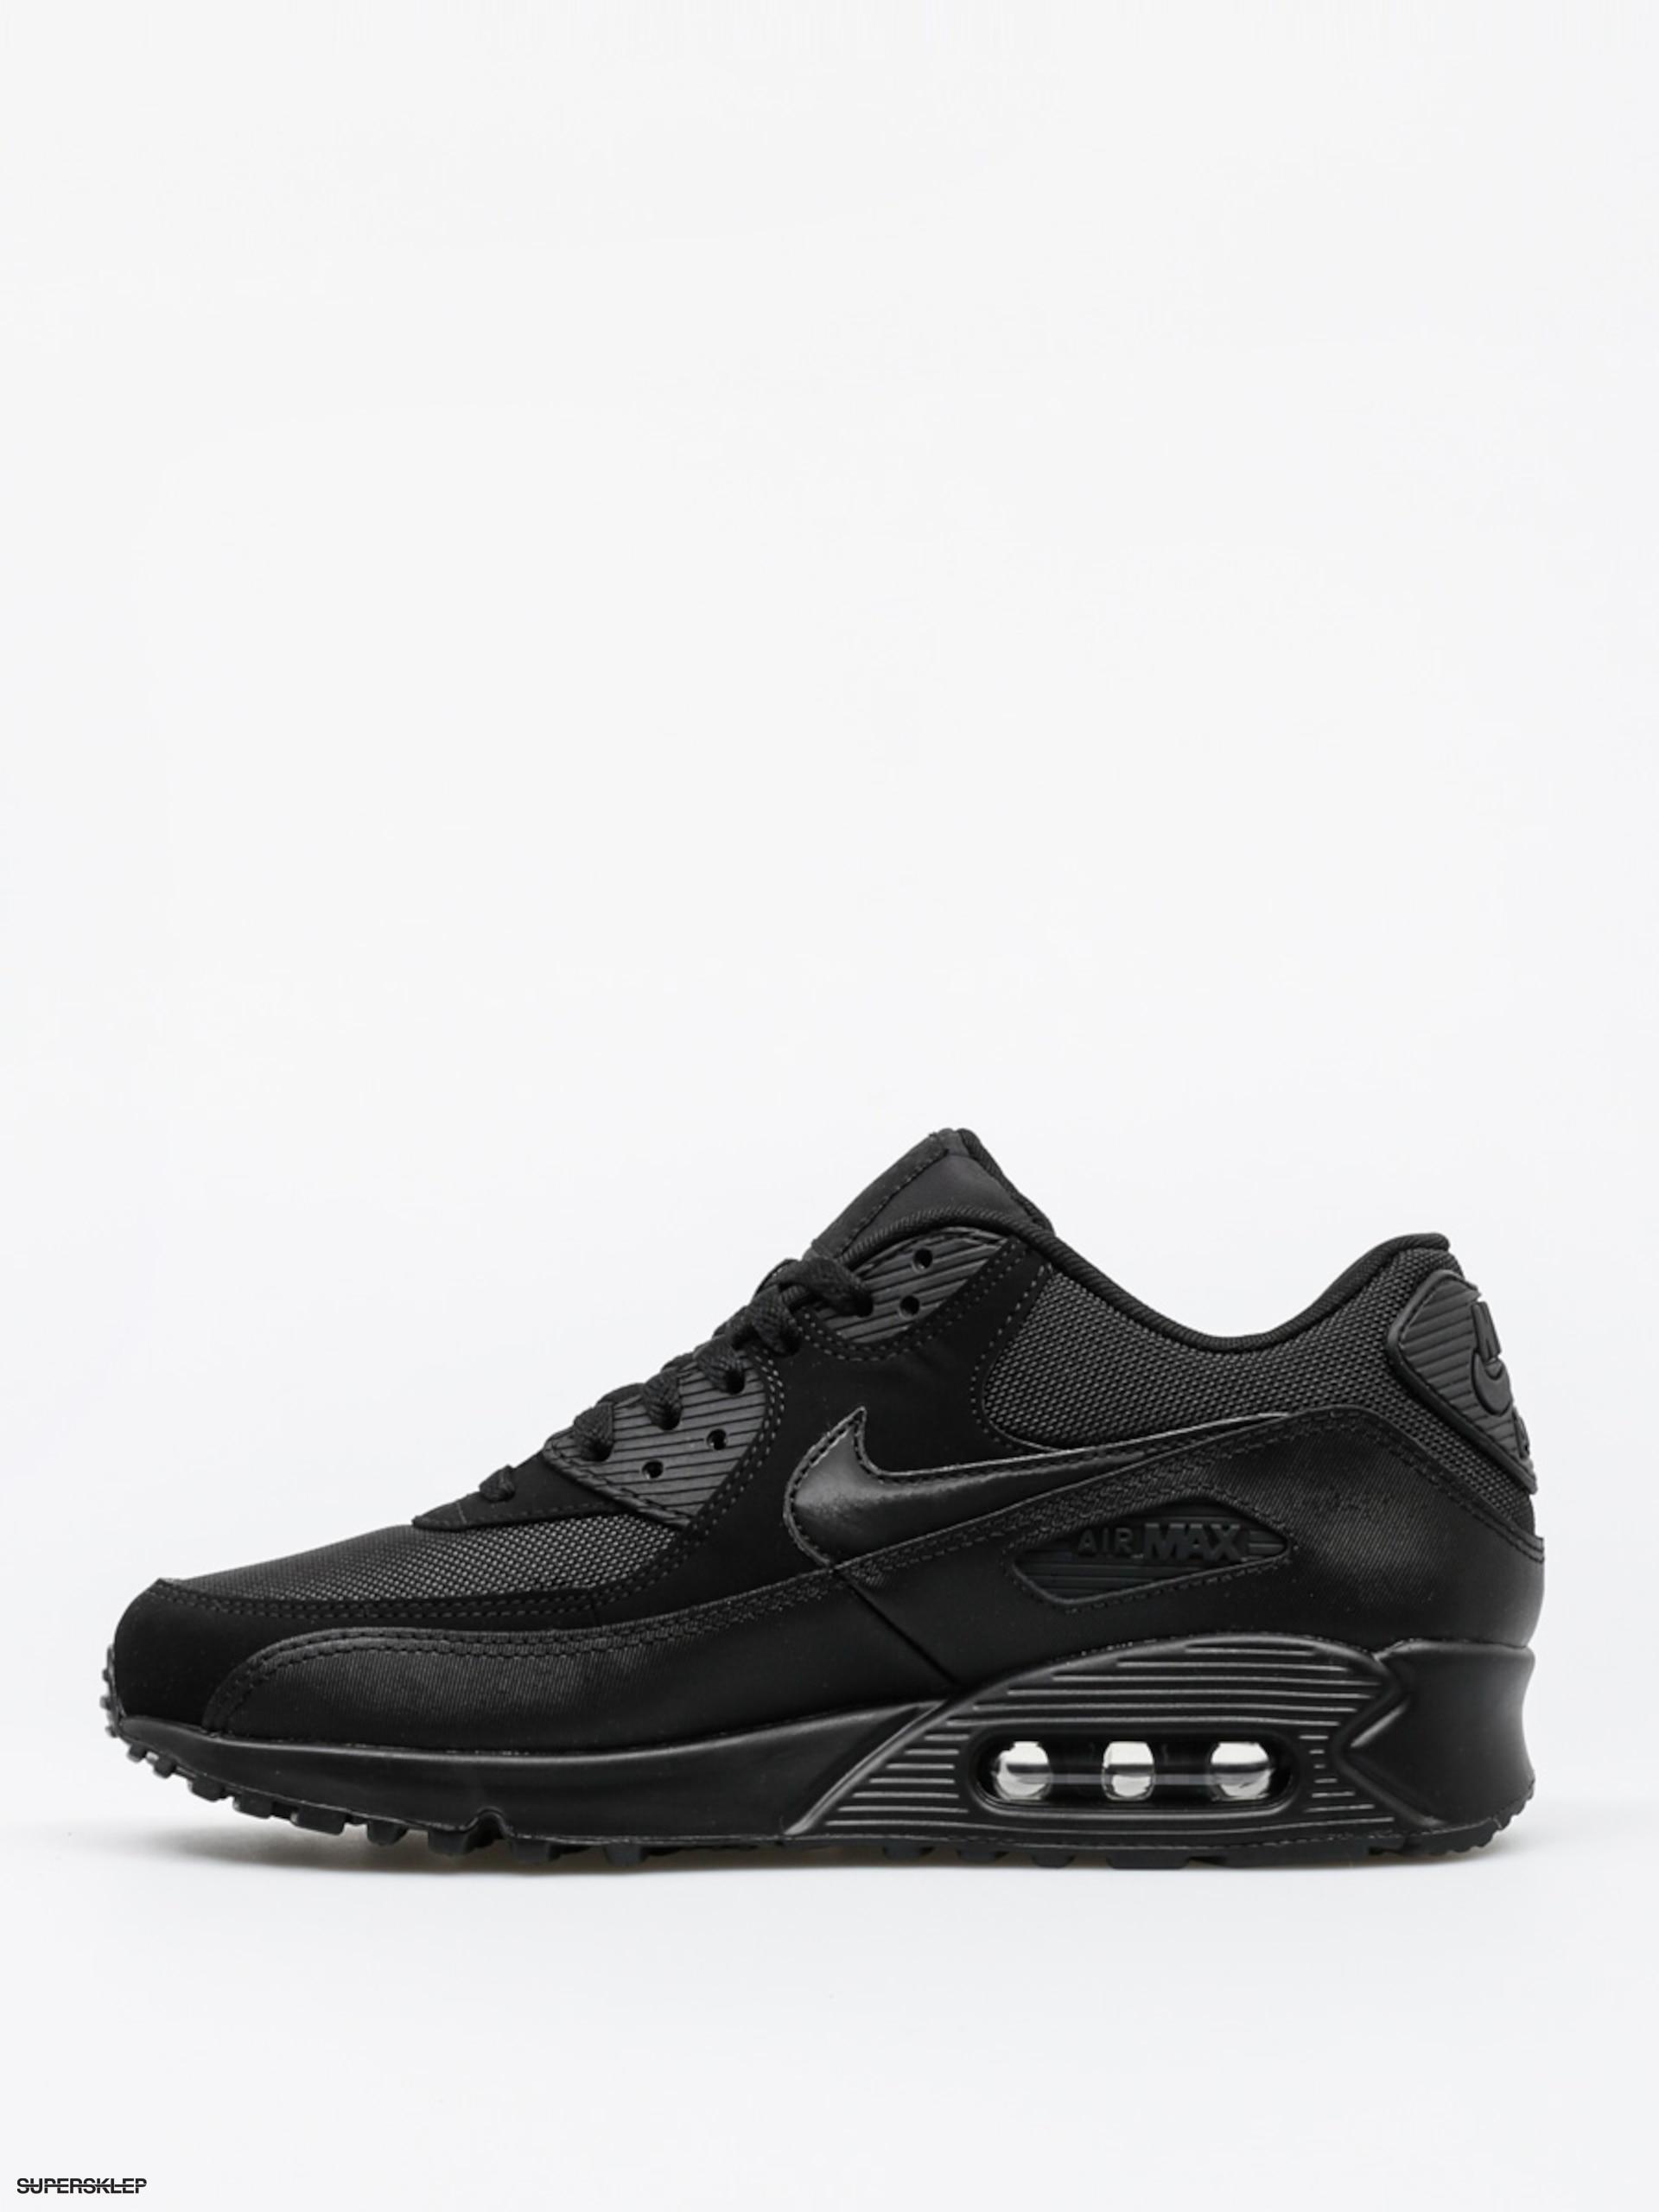 Buty Nike Air Max 90 Essential białe 537384 129 Ceny i